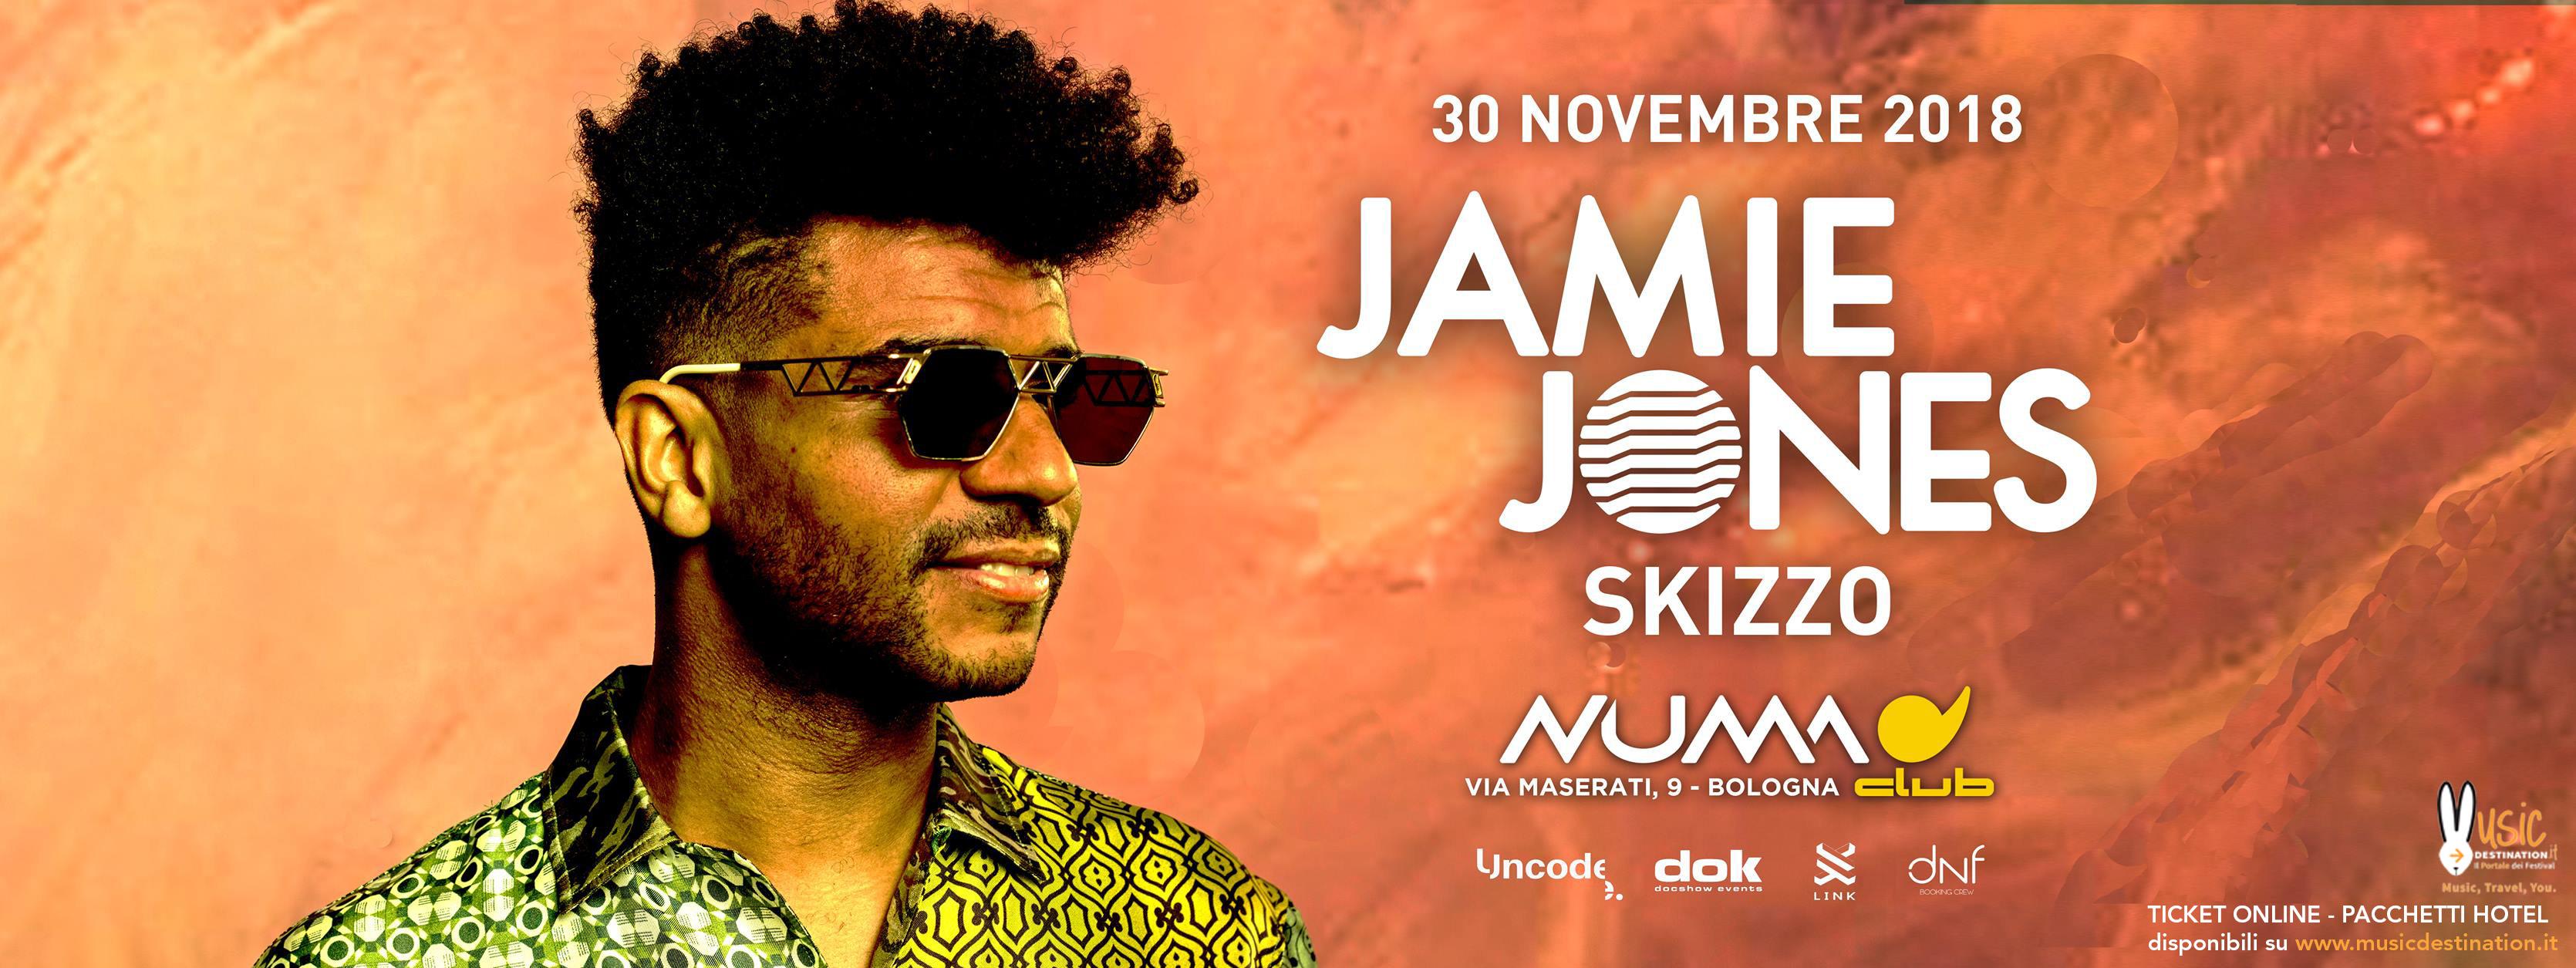 Jamie Jones @ Numa Bologna – 30 Novembre 2018 – Ticket Pacchetti Hotel